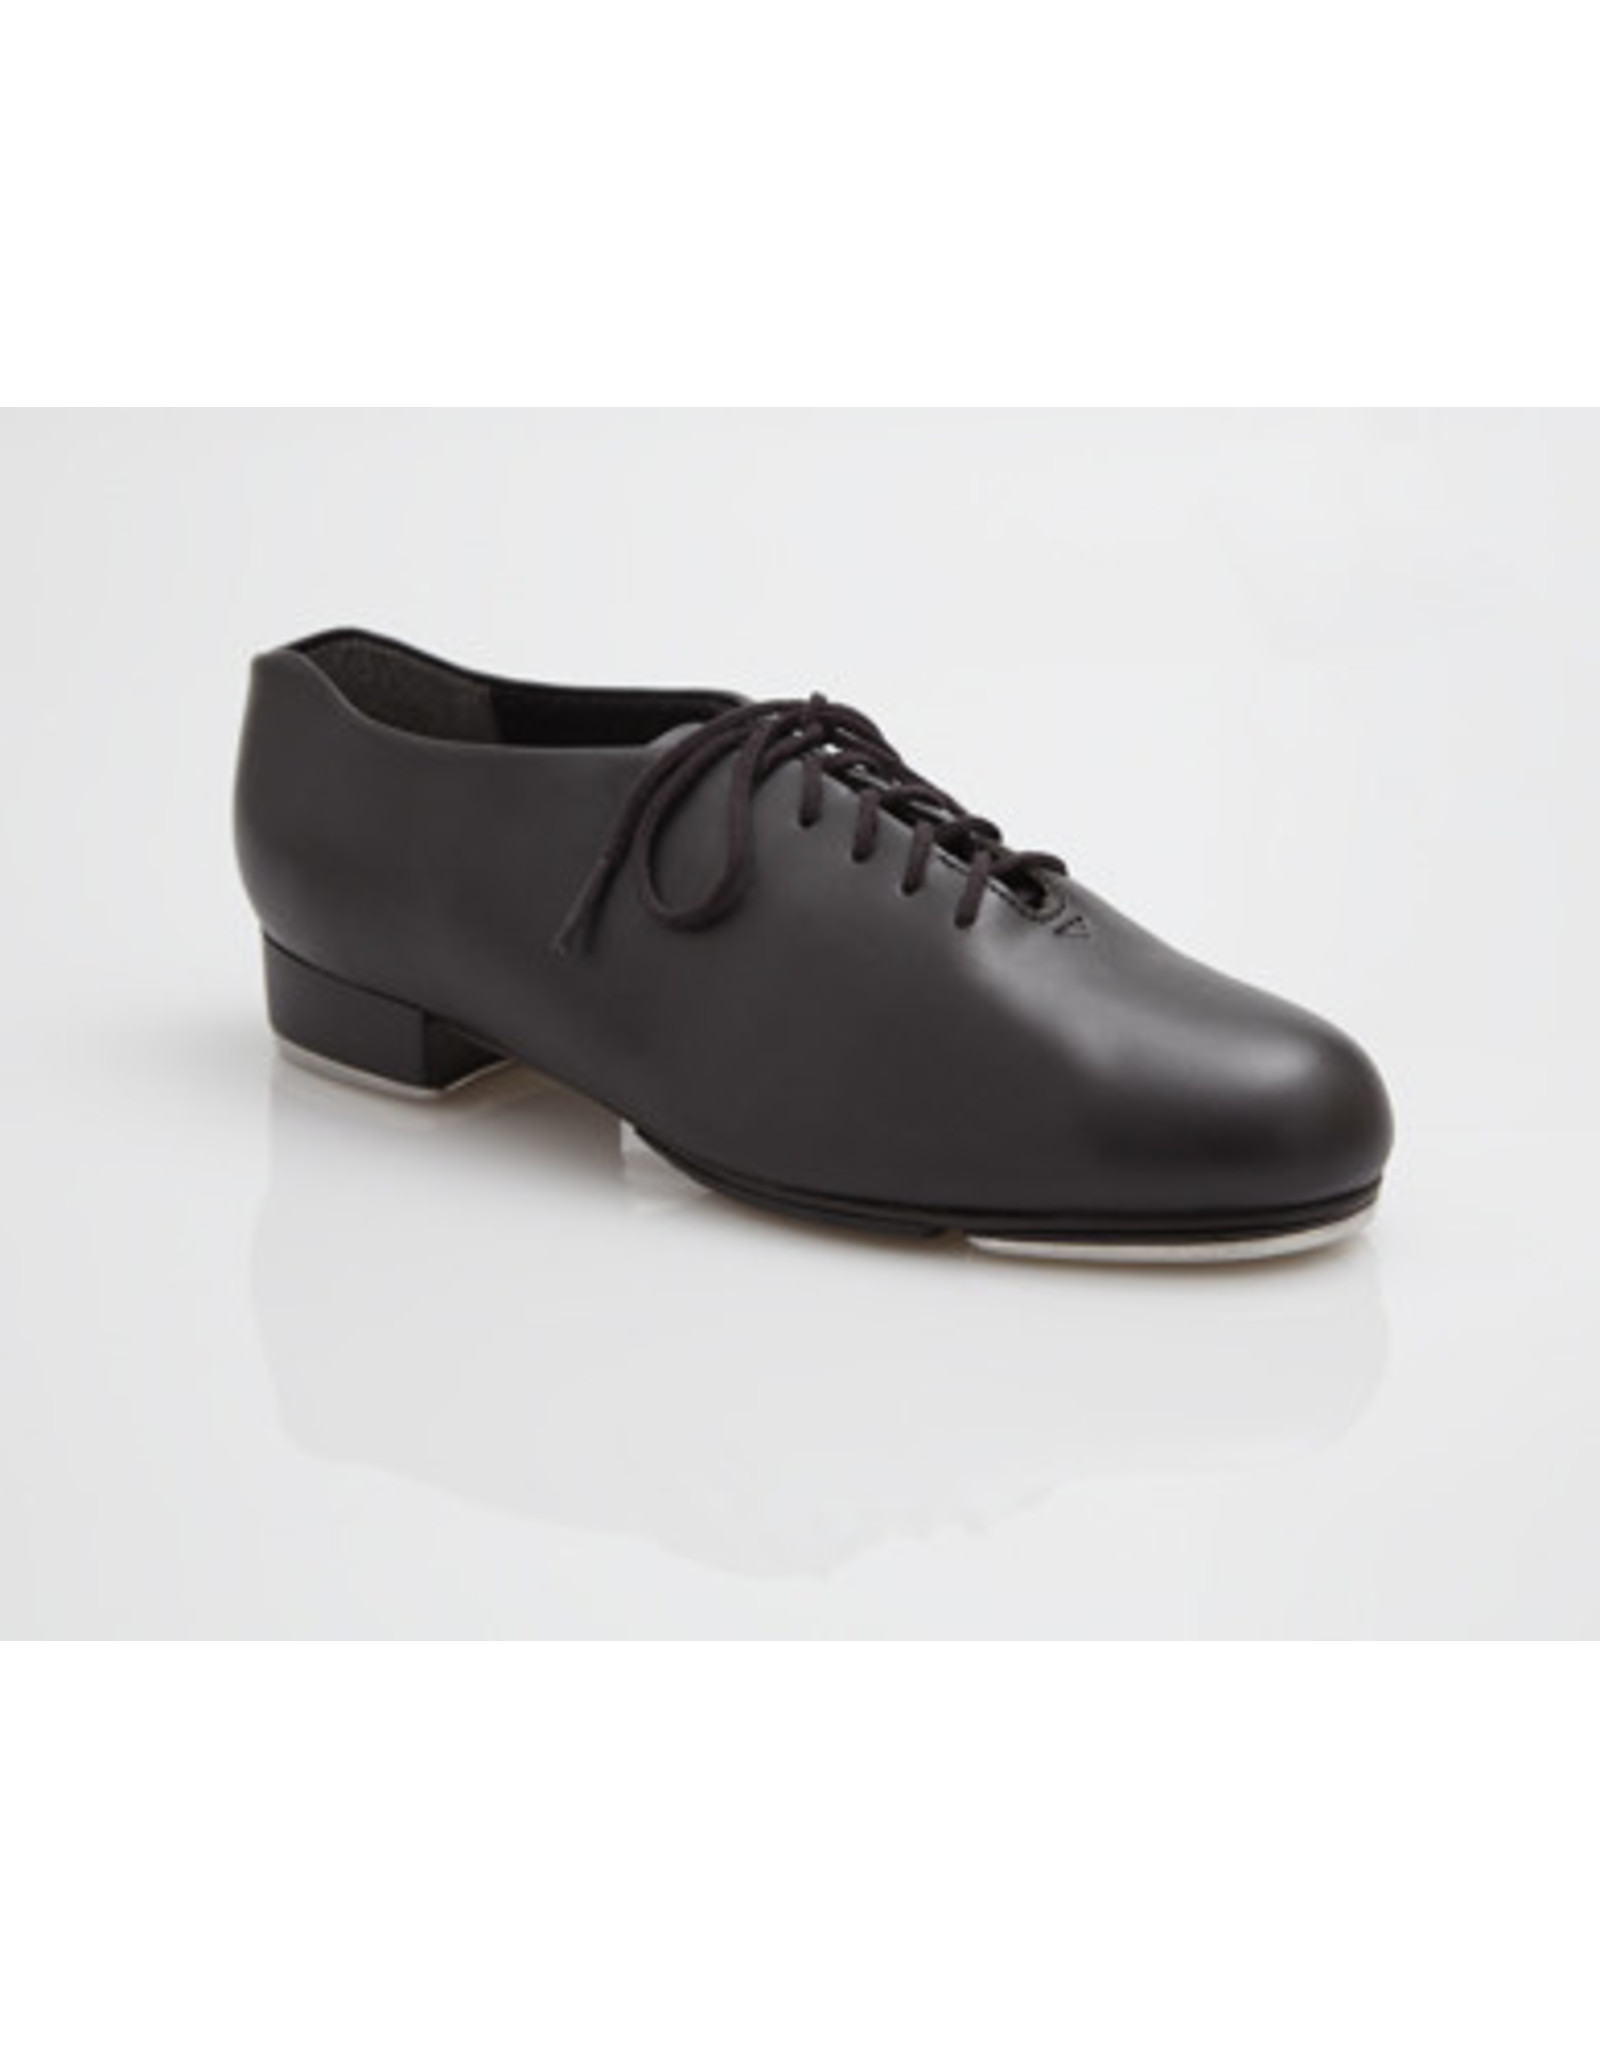 Capezio / Bunheads Tic Toc Toe Tap Shoe (443)